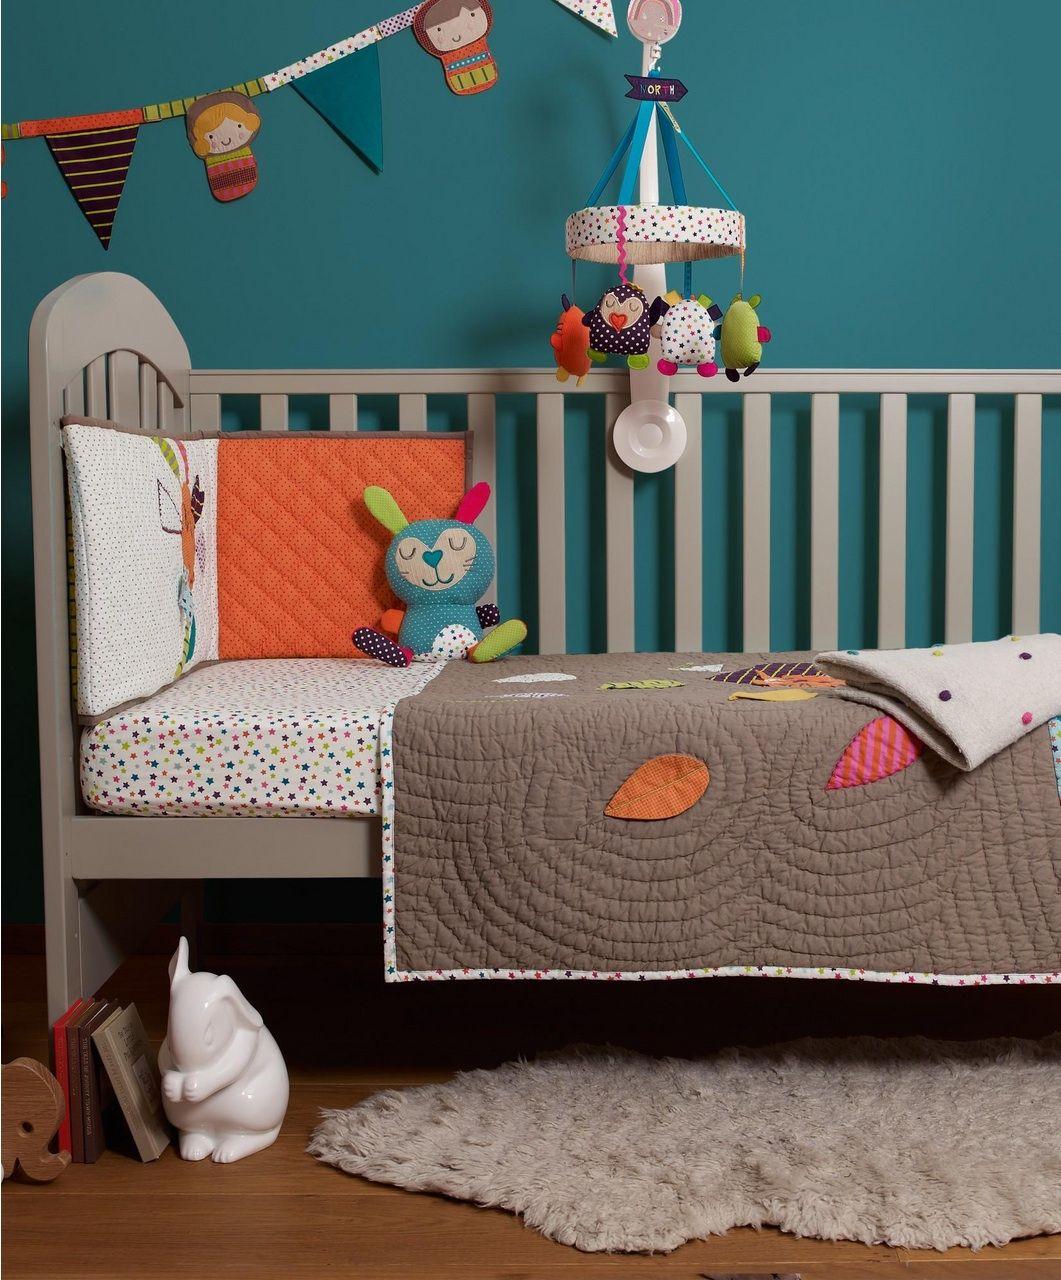 Timbuktales Nursery Bedding by Mamas